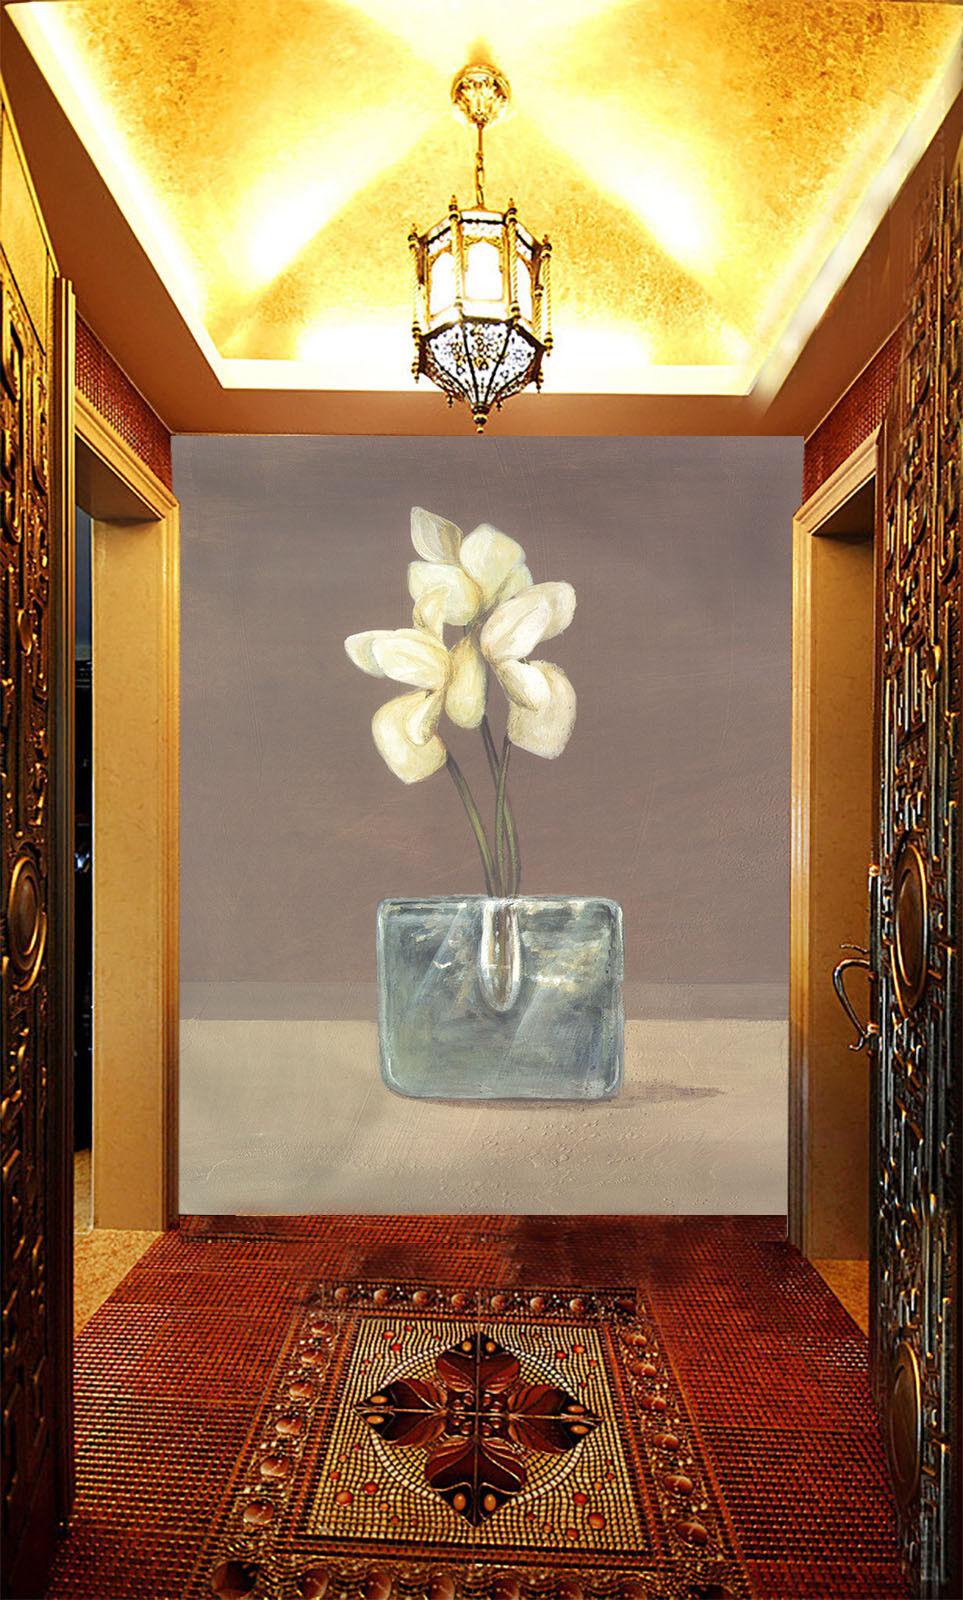 3D Flower Paint 618 Wallpaper Murals Wall Print Wallpaper Mural AJ WALL AU Kyra